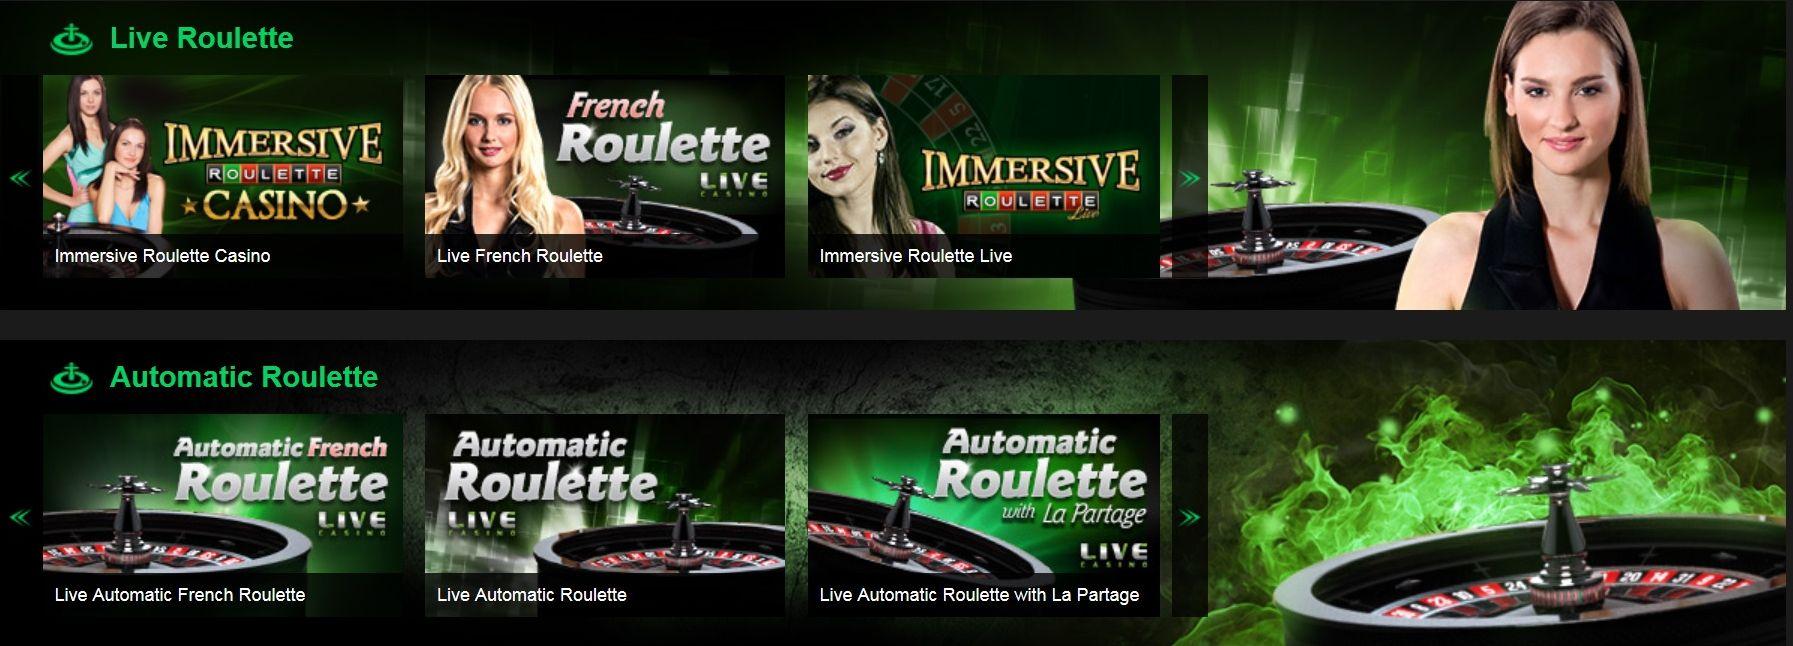 NetBet live roulette